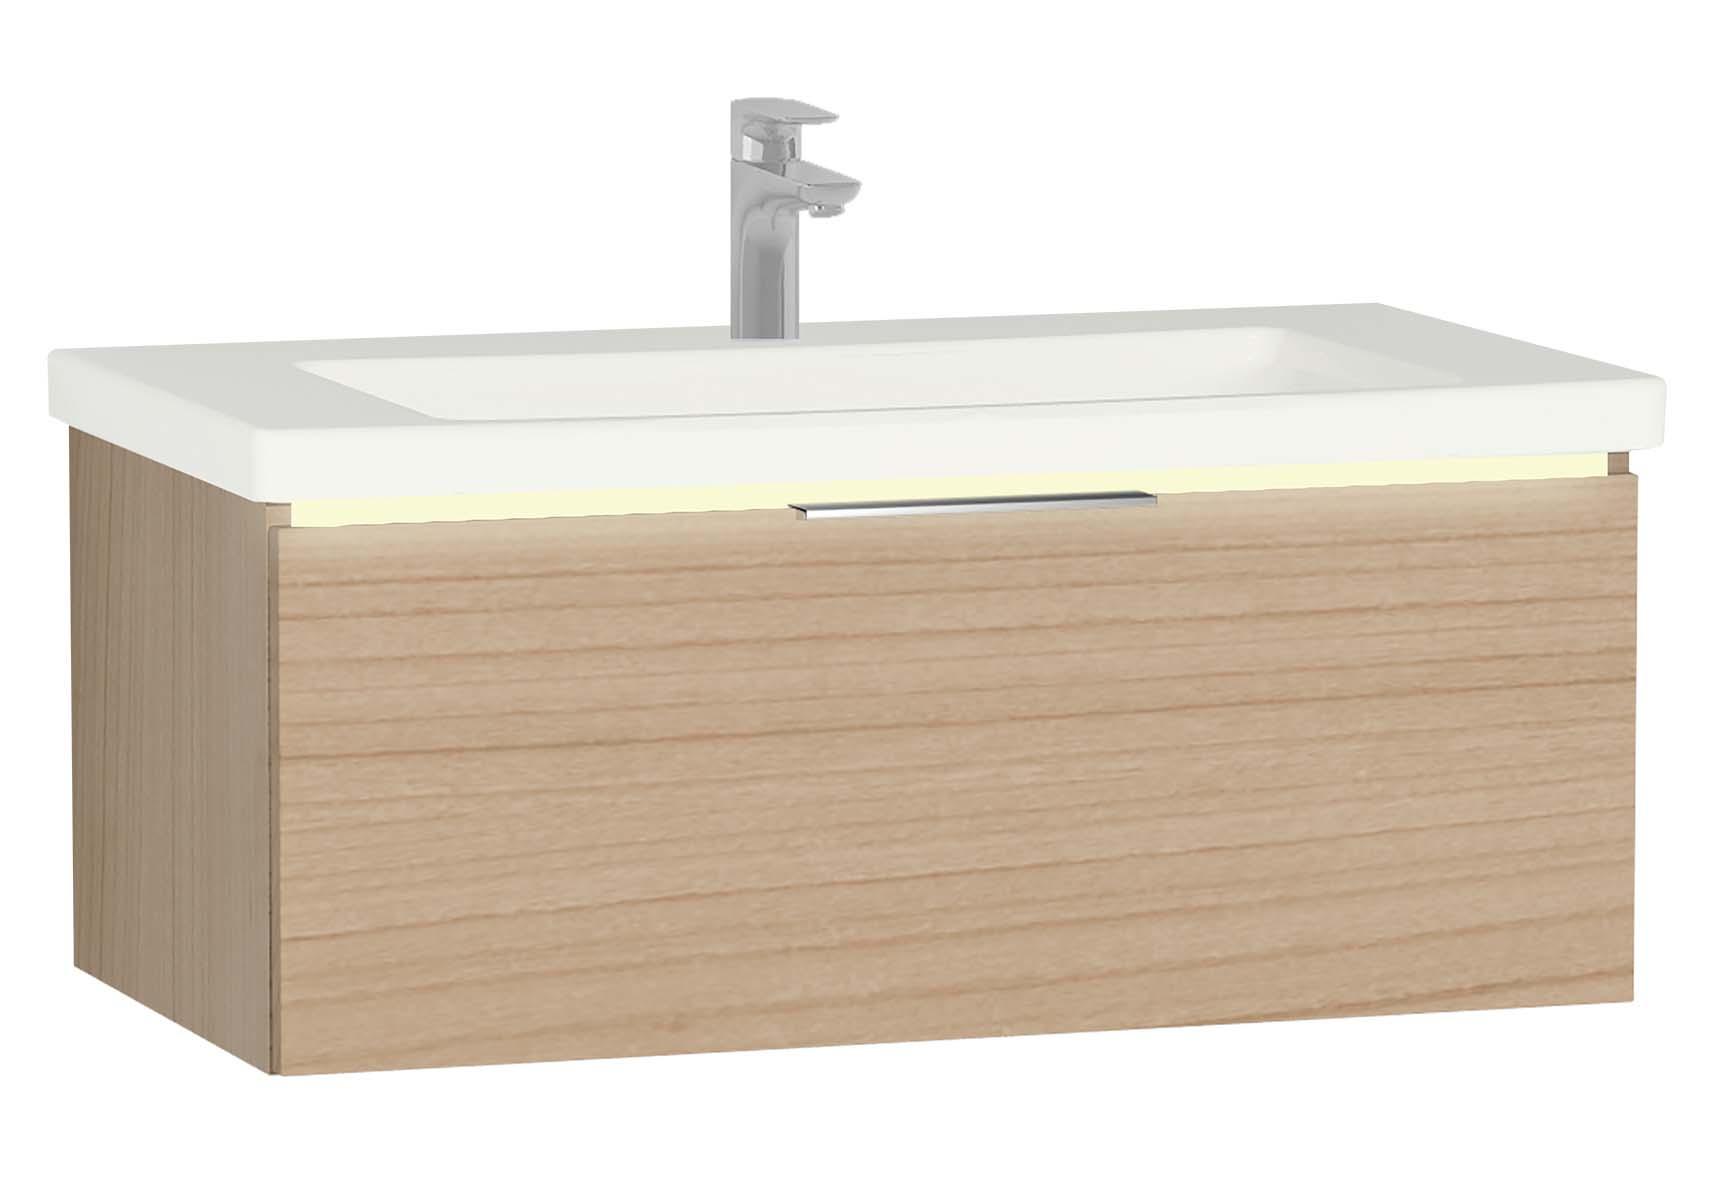 Central Washbasin Unit with 1 drawer, 90 cm, Golden Cherry, Ceramic Washbasin, Led